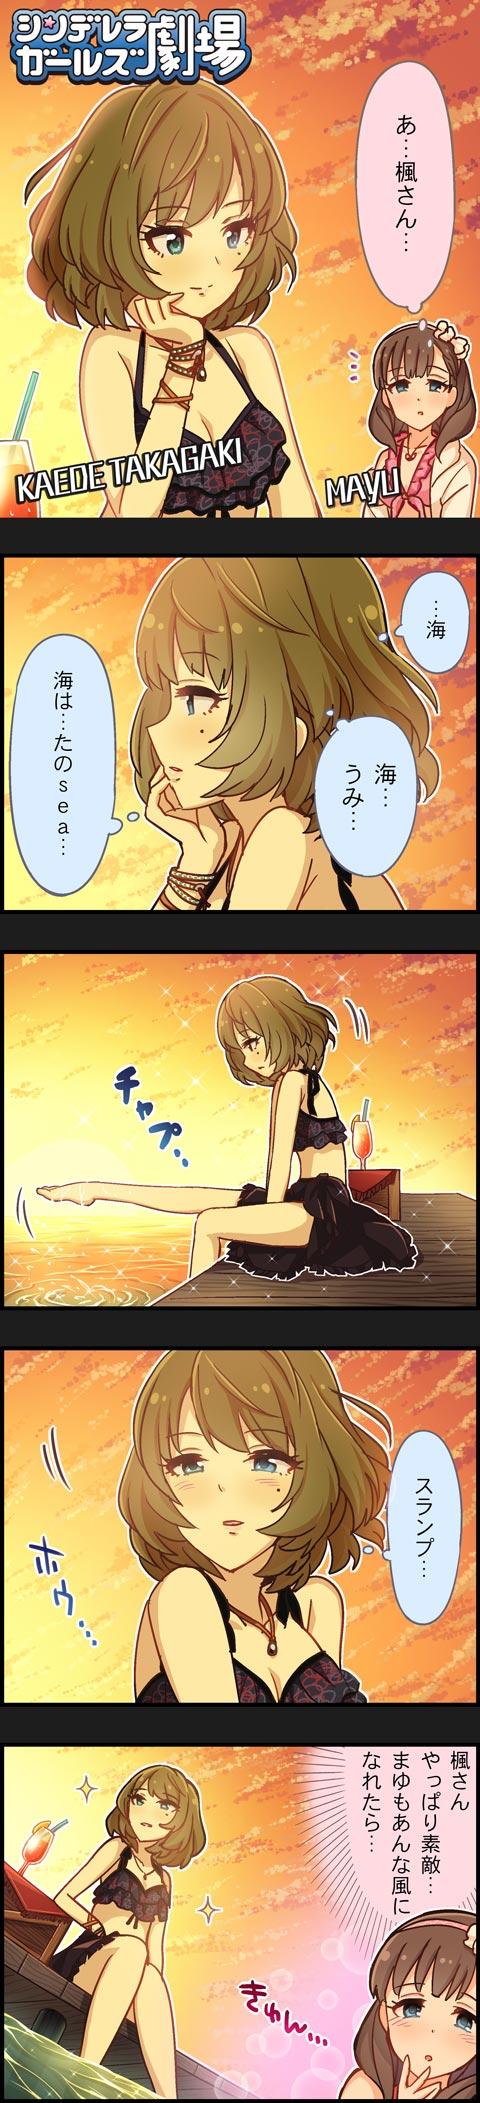 sakuma mayu and takagaki kaede (idolmaster cinderella girls and etc)